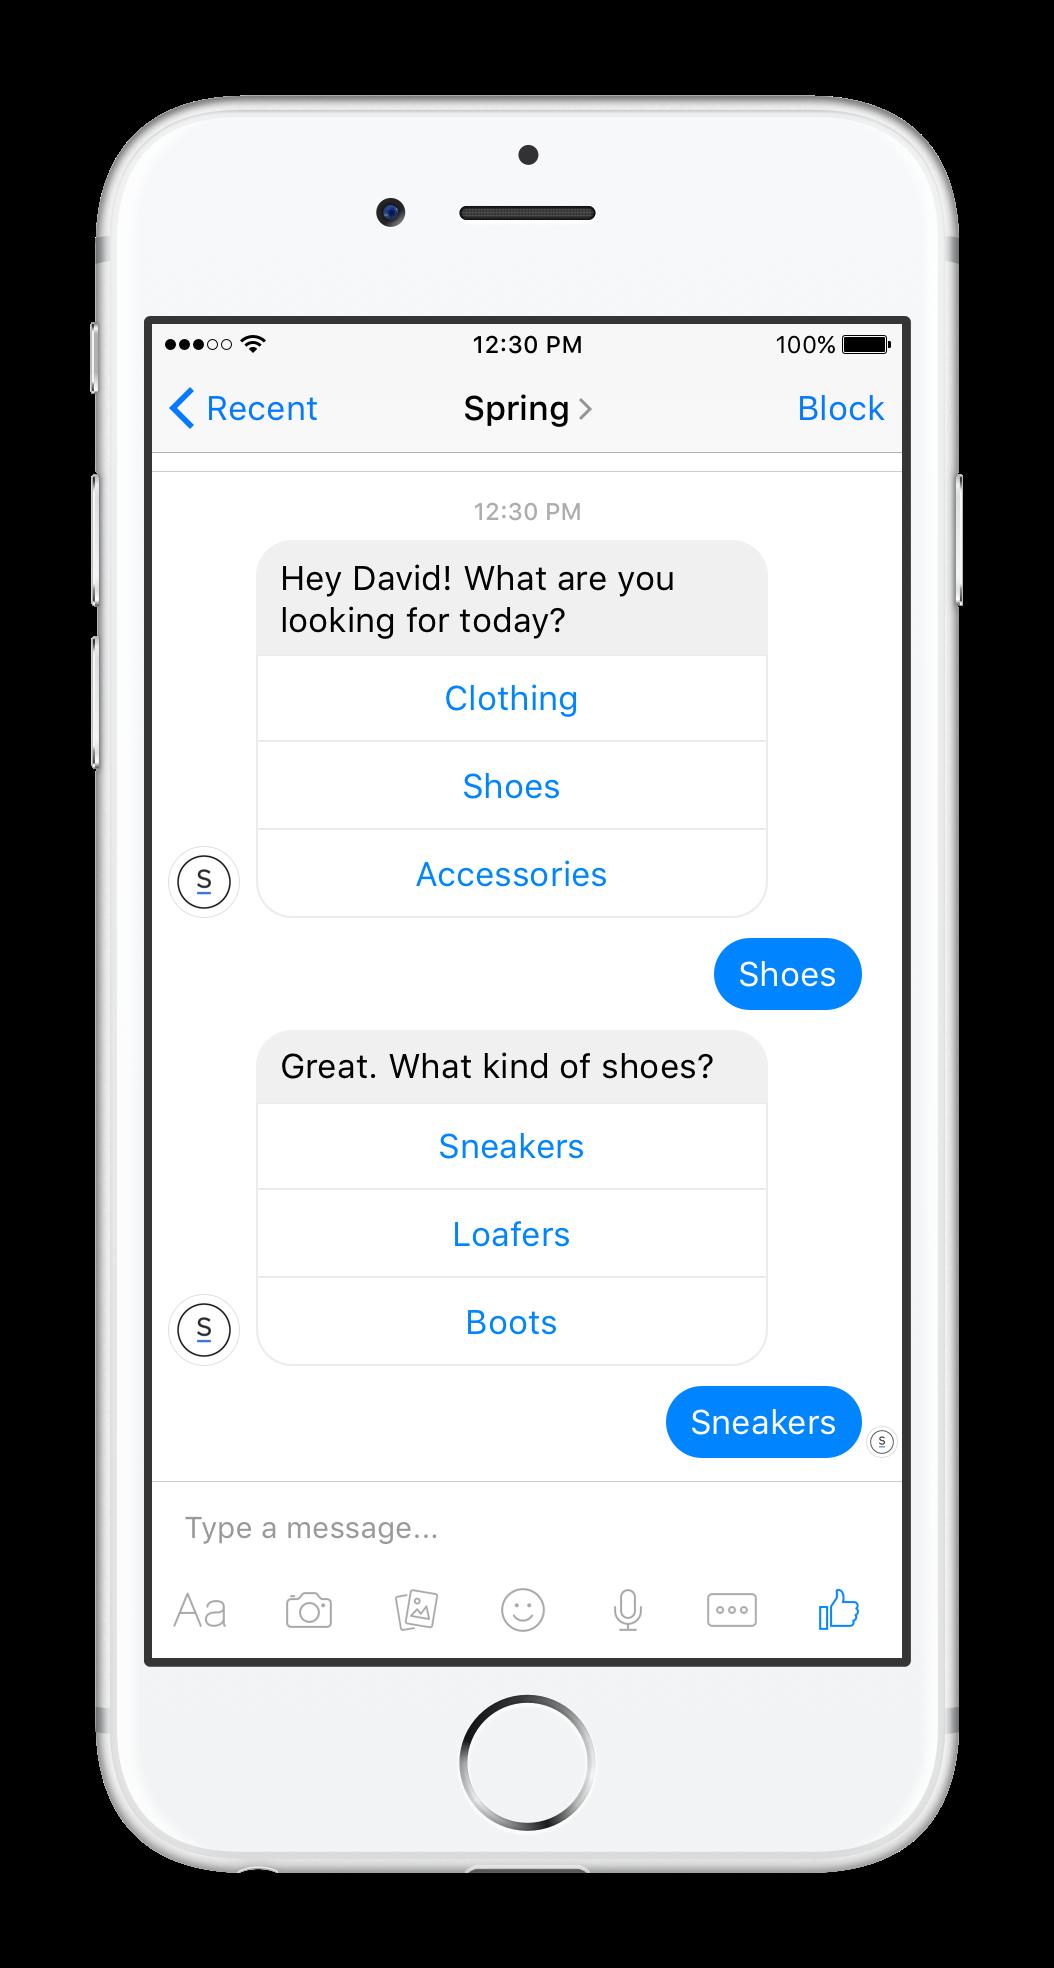 Spring's bot in Facebook's Messenger app.